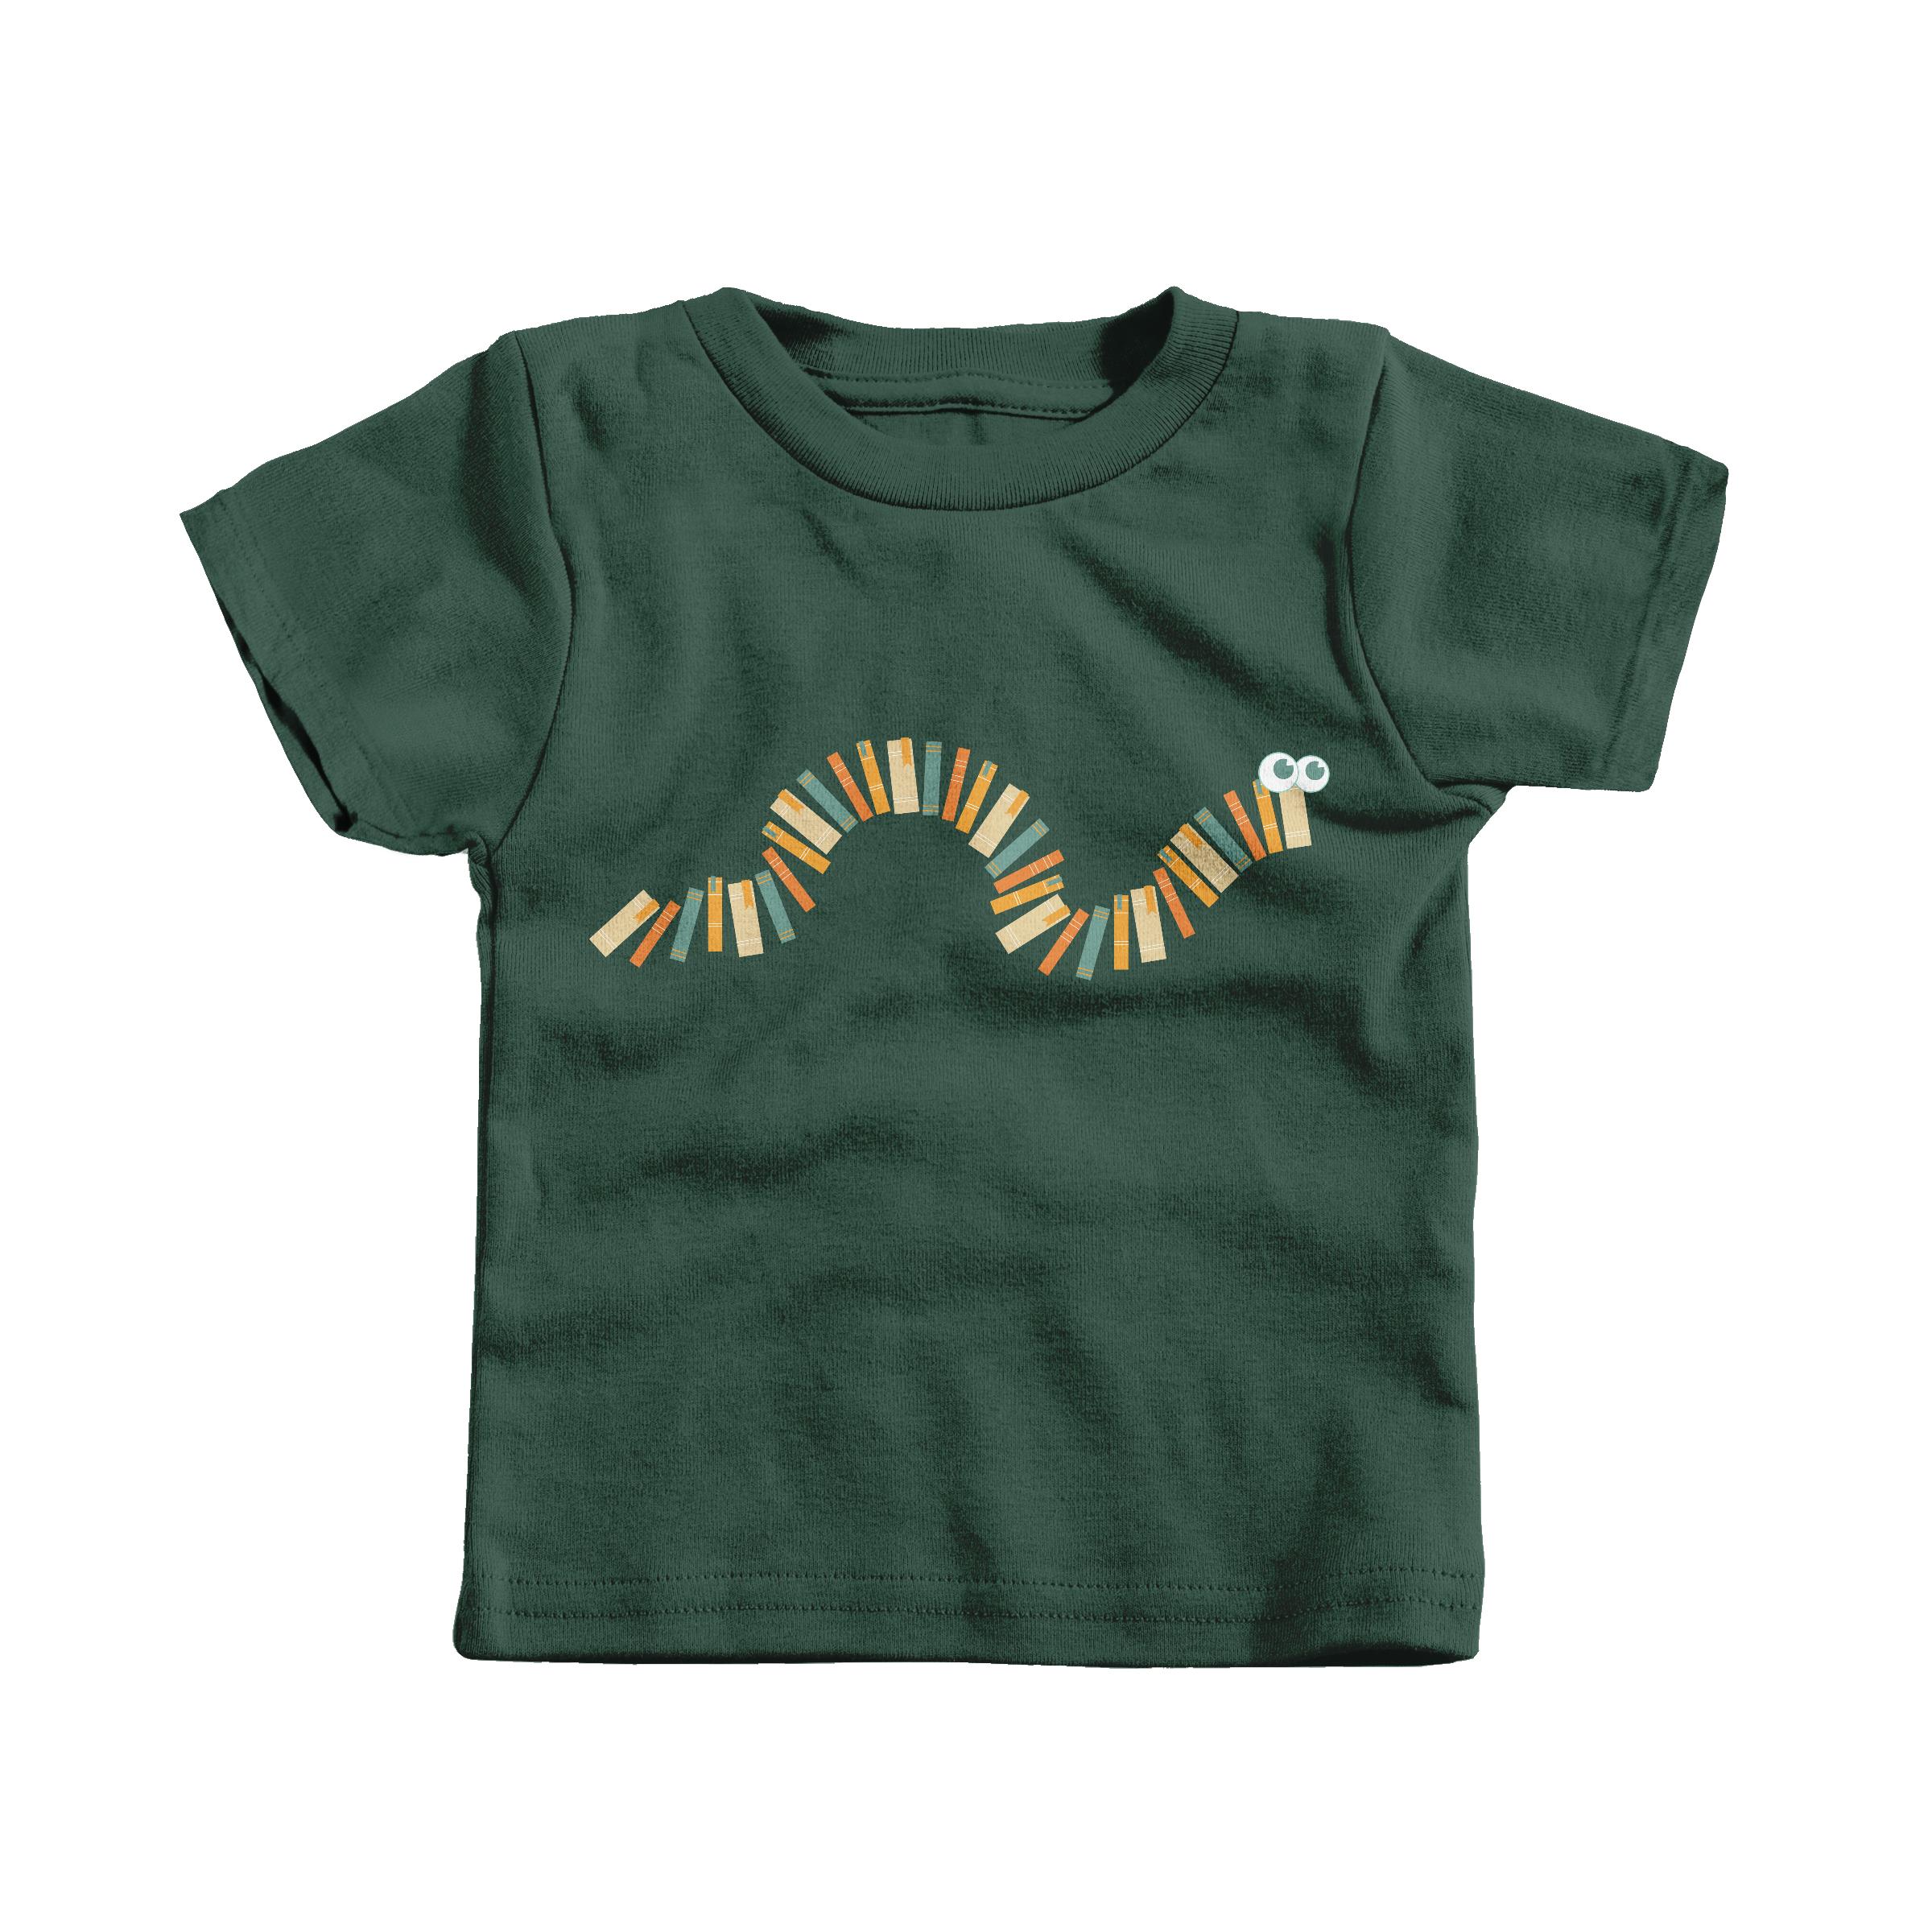 Bookworm Forest (Infant)